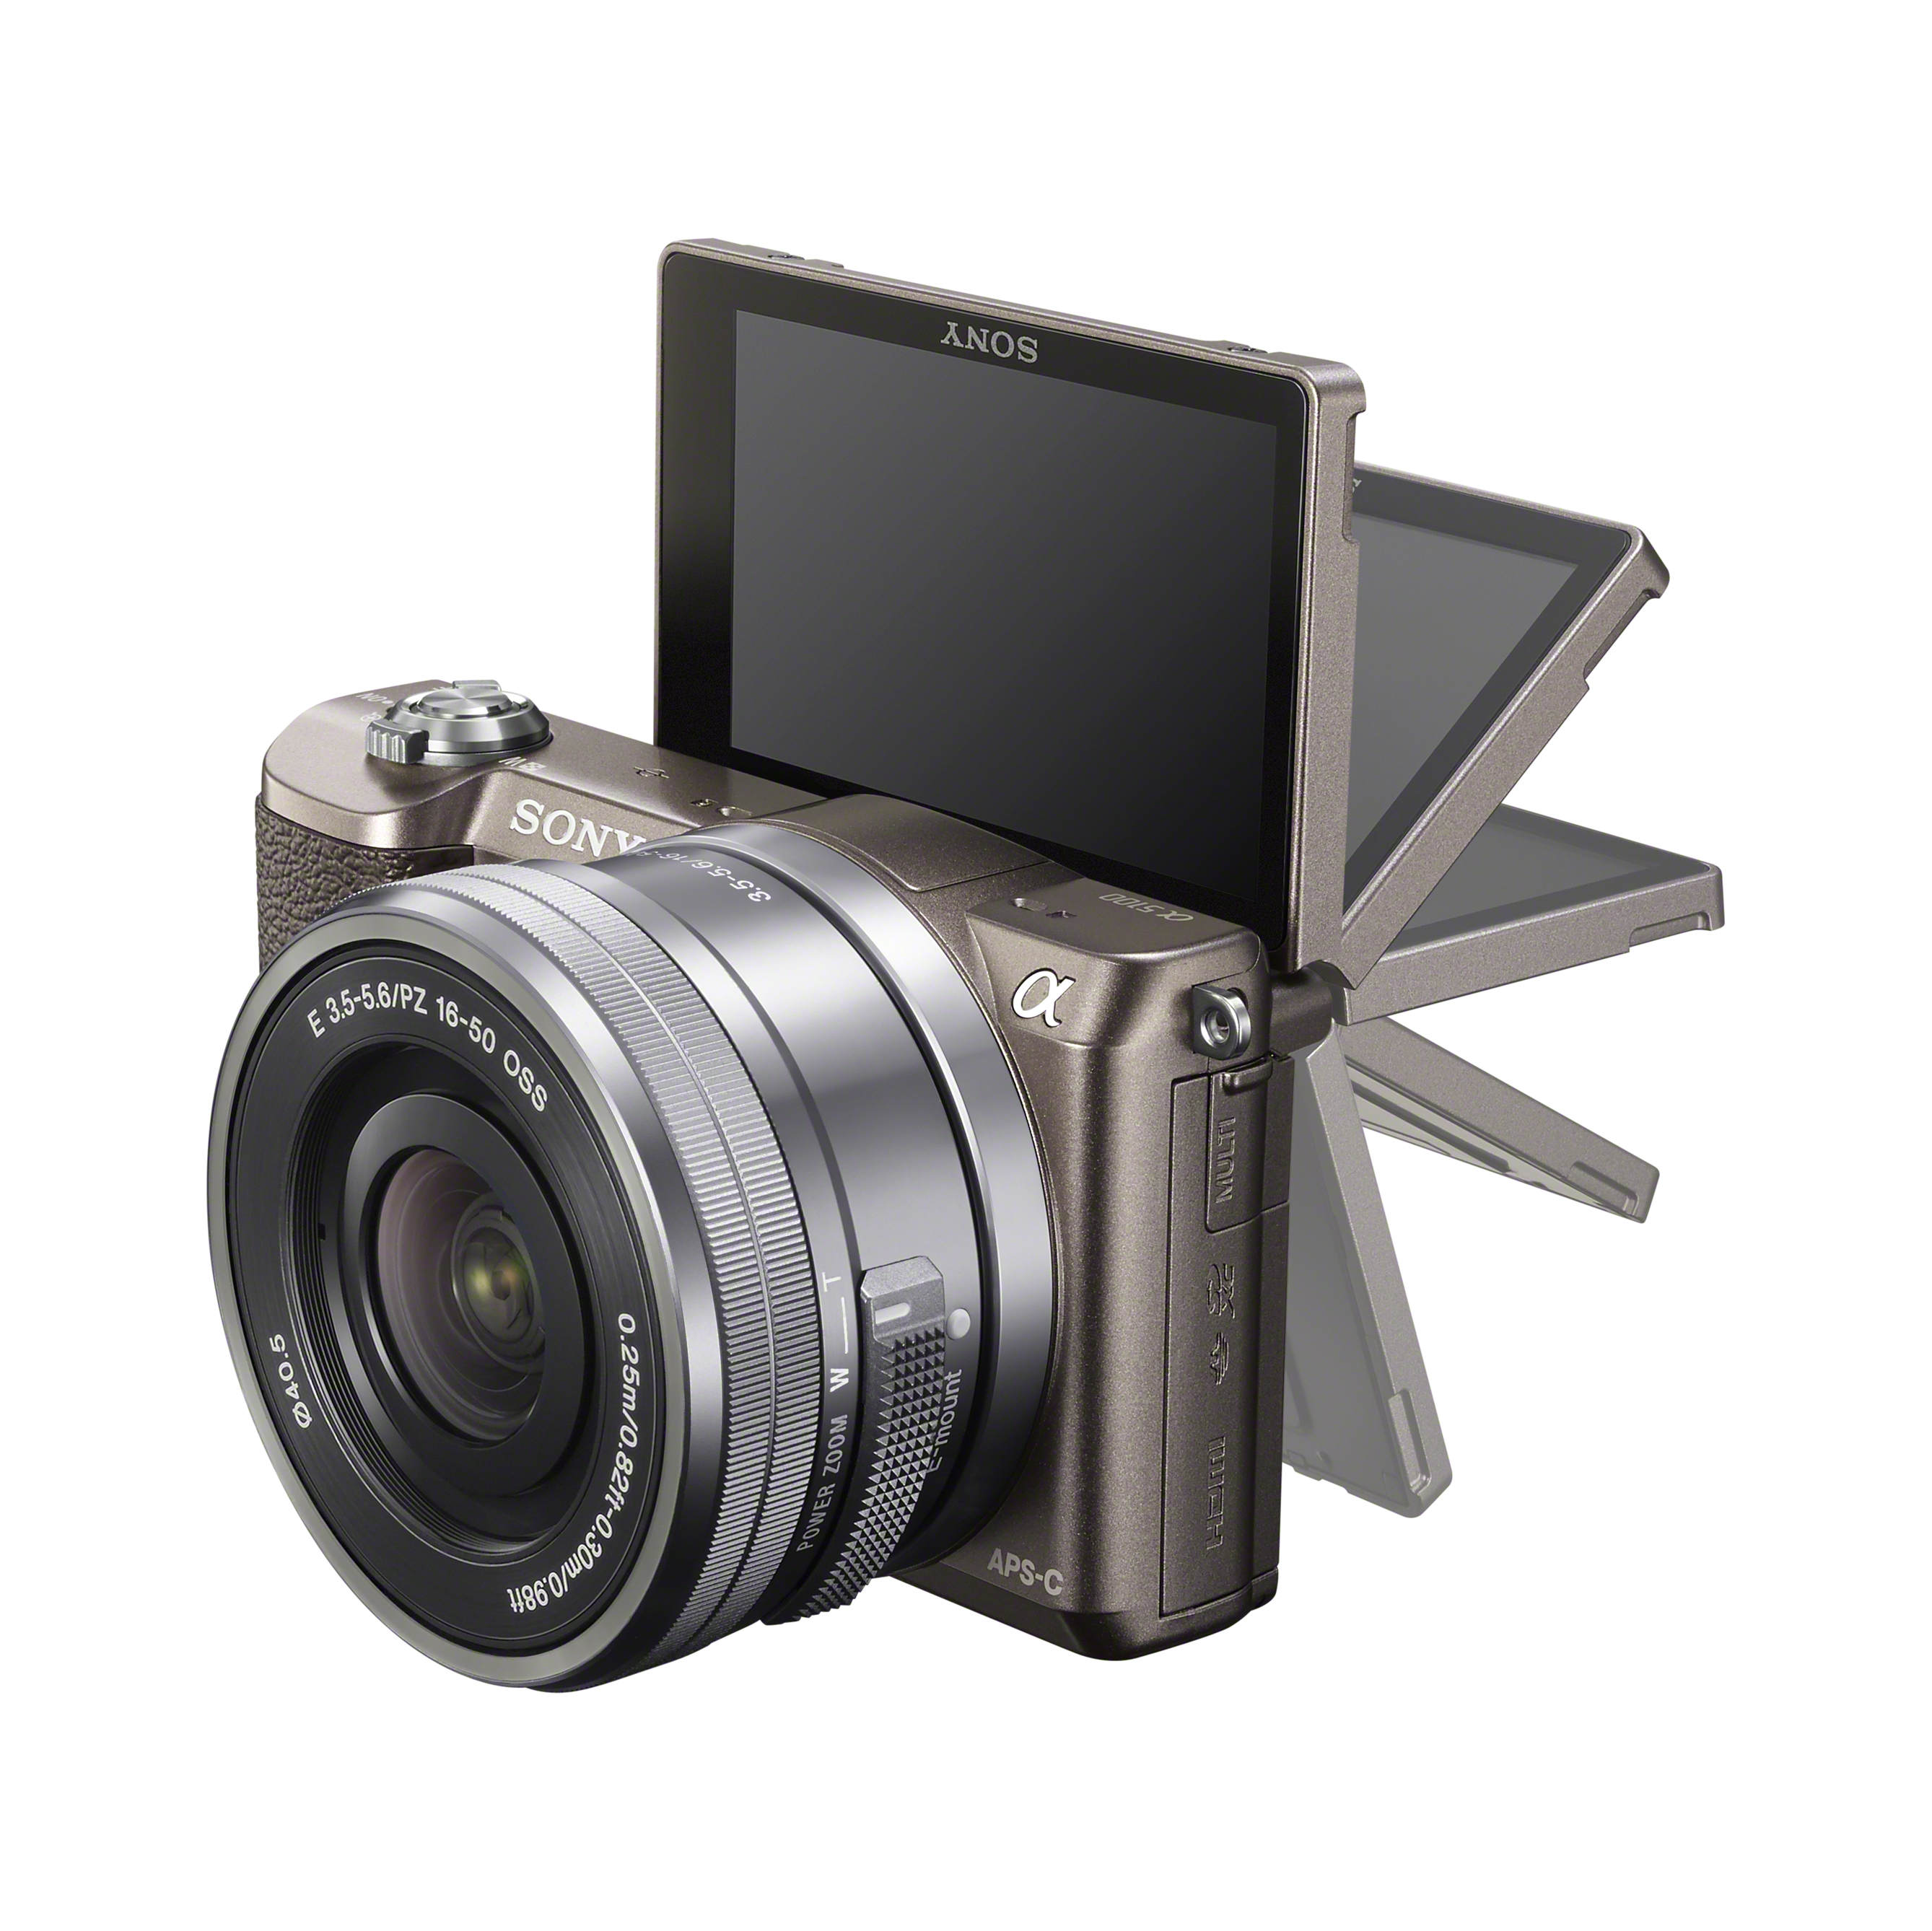 fotoapparat sony a 6000 avchd